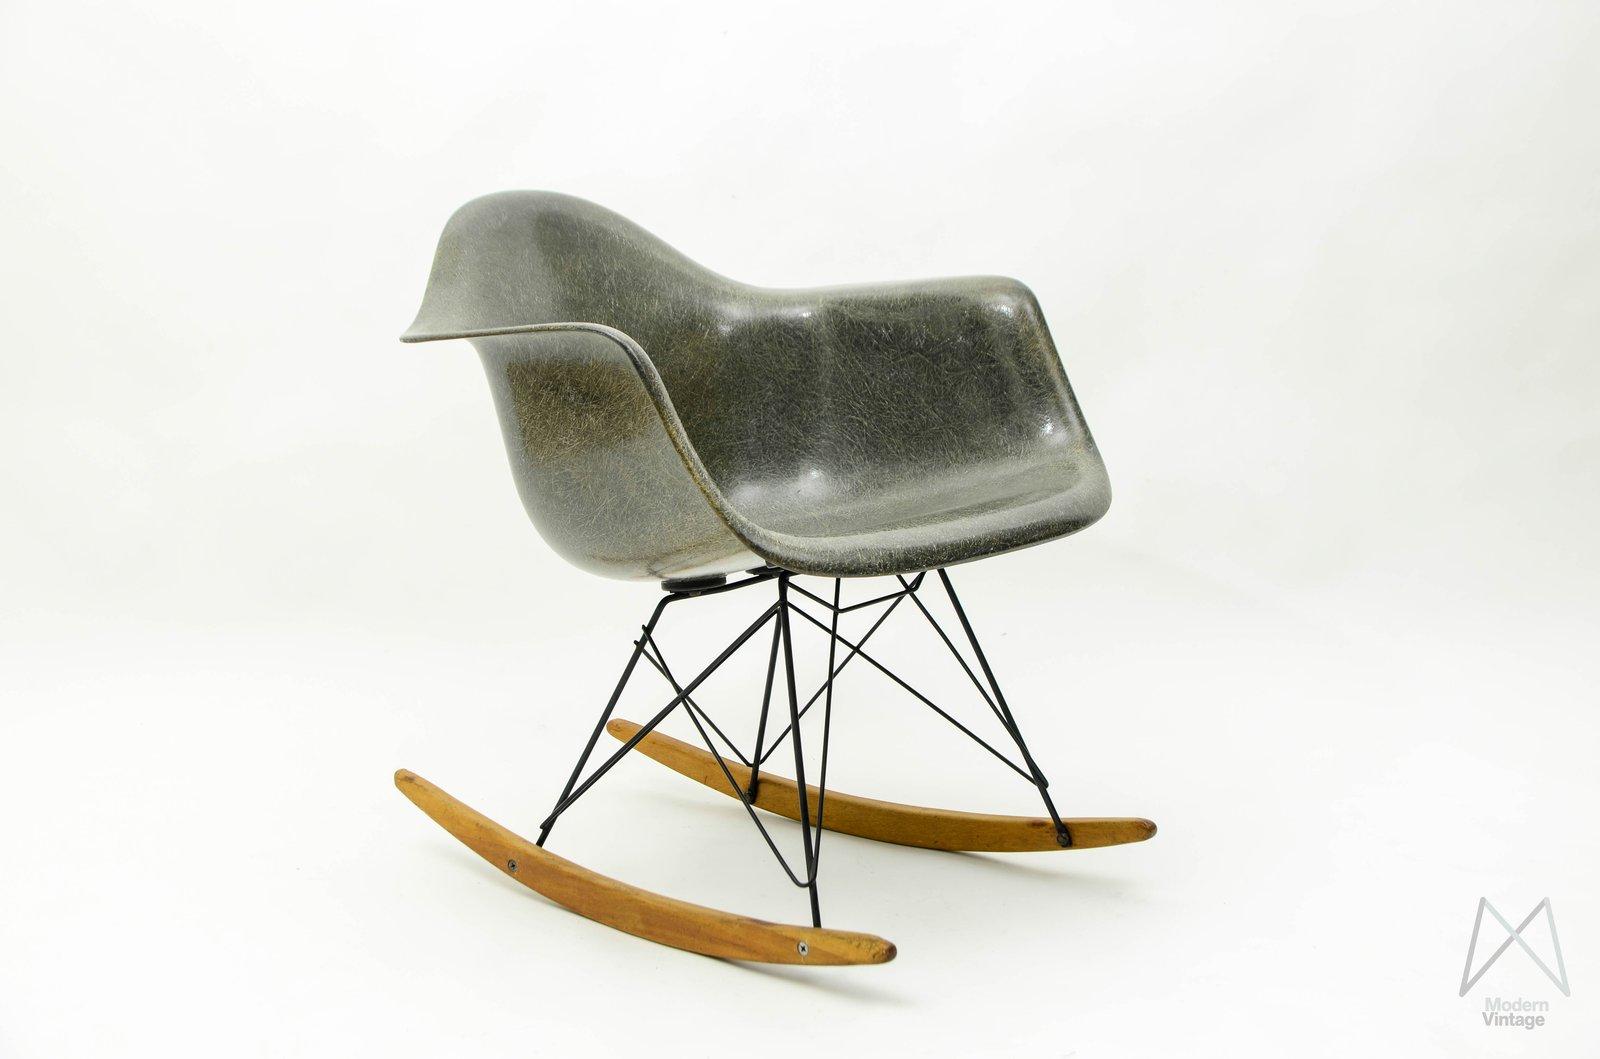 Modern Vintage Amsterdam Original Eames Furniture